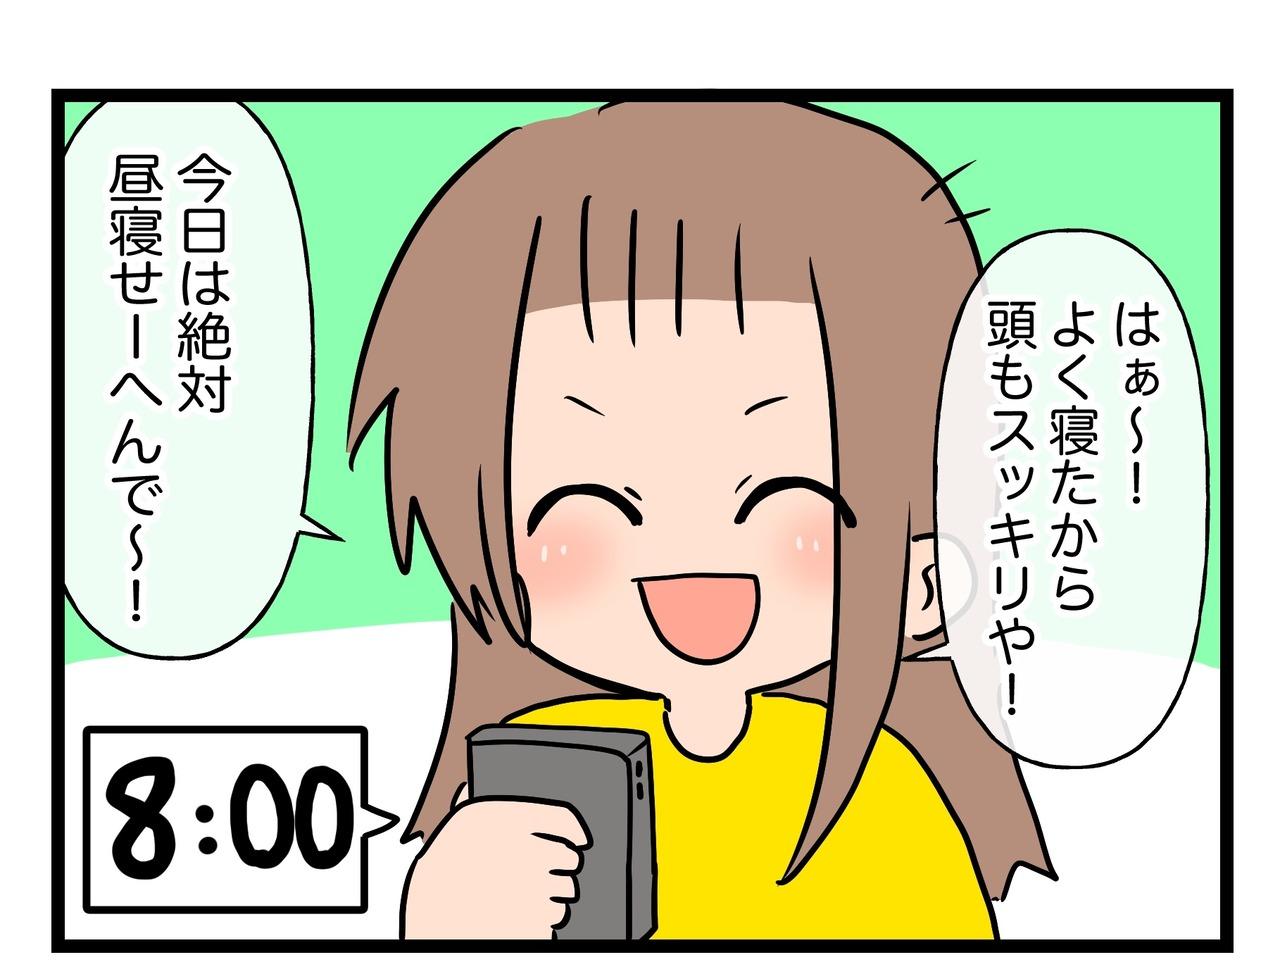 DDCE90F1-474F-40C3-A494-7C84842BA129